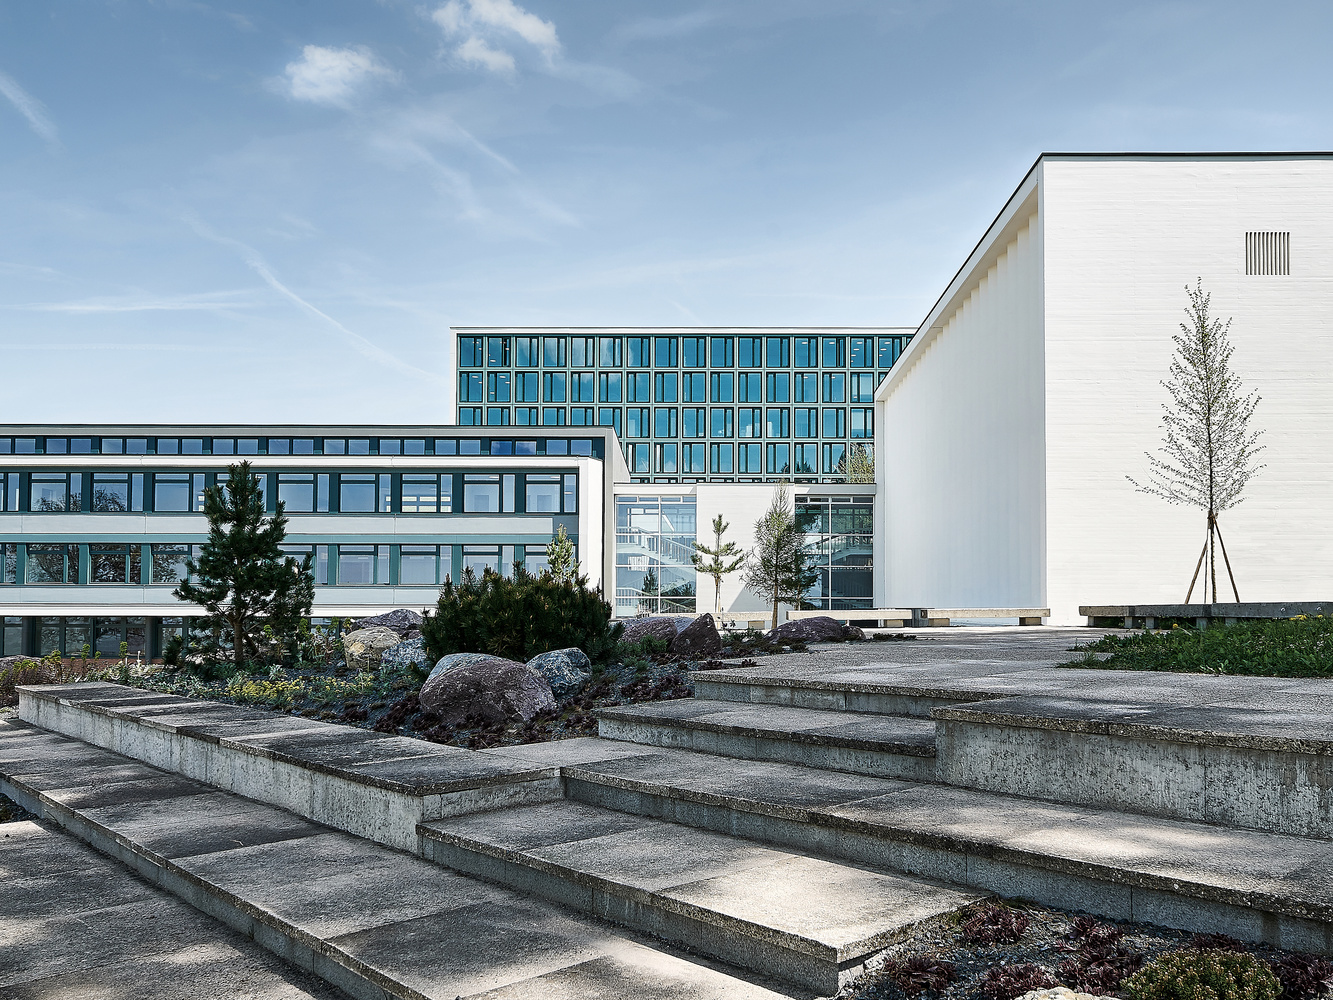 Kantonsschule Menzingen by Sebastian Grundgeir